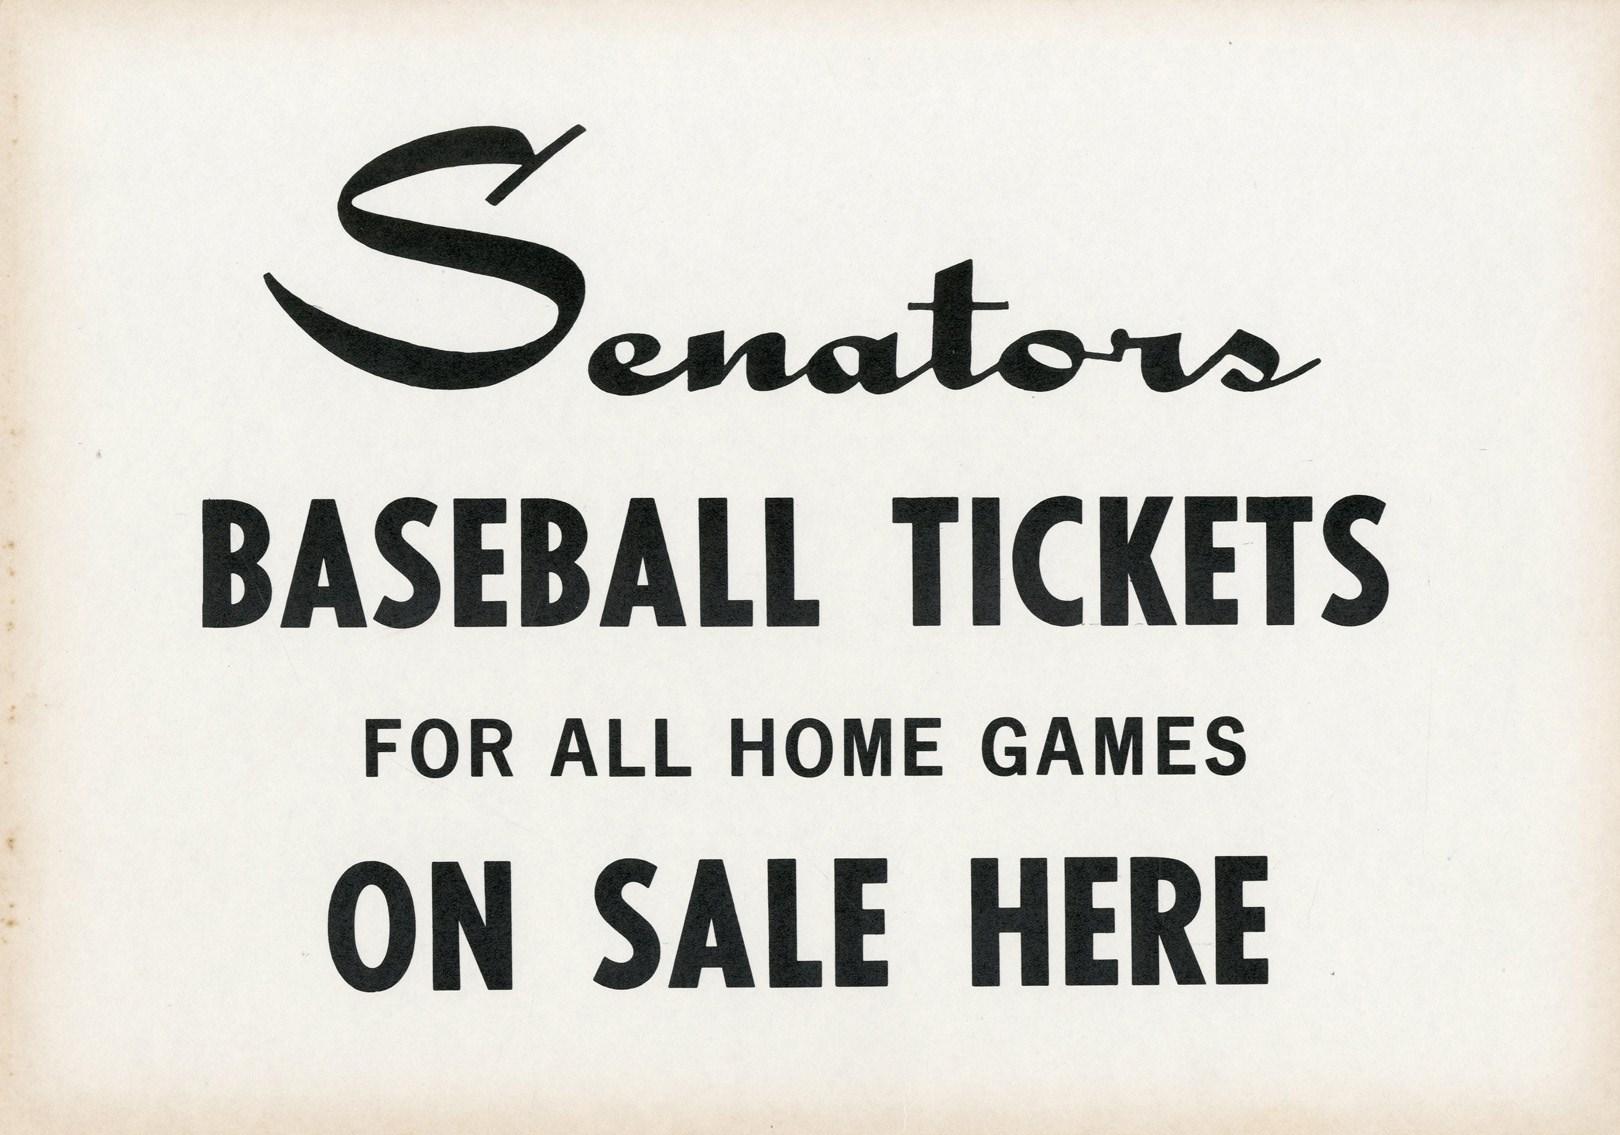 Stadium Artifacts - Leland's Classic